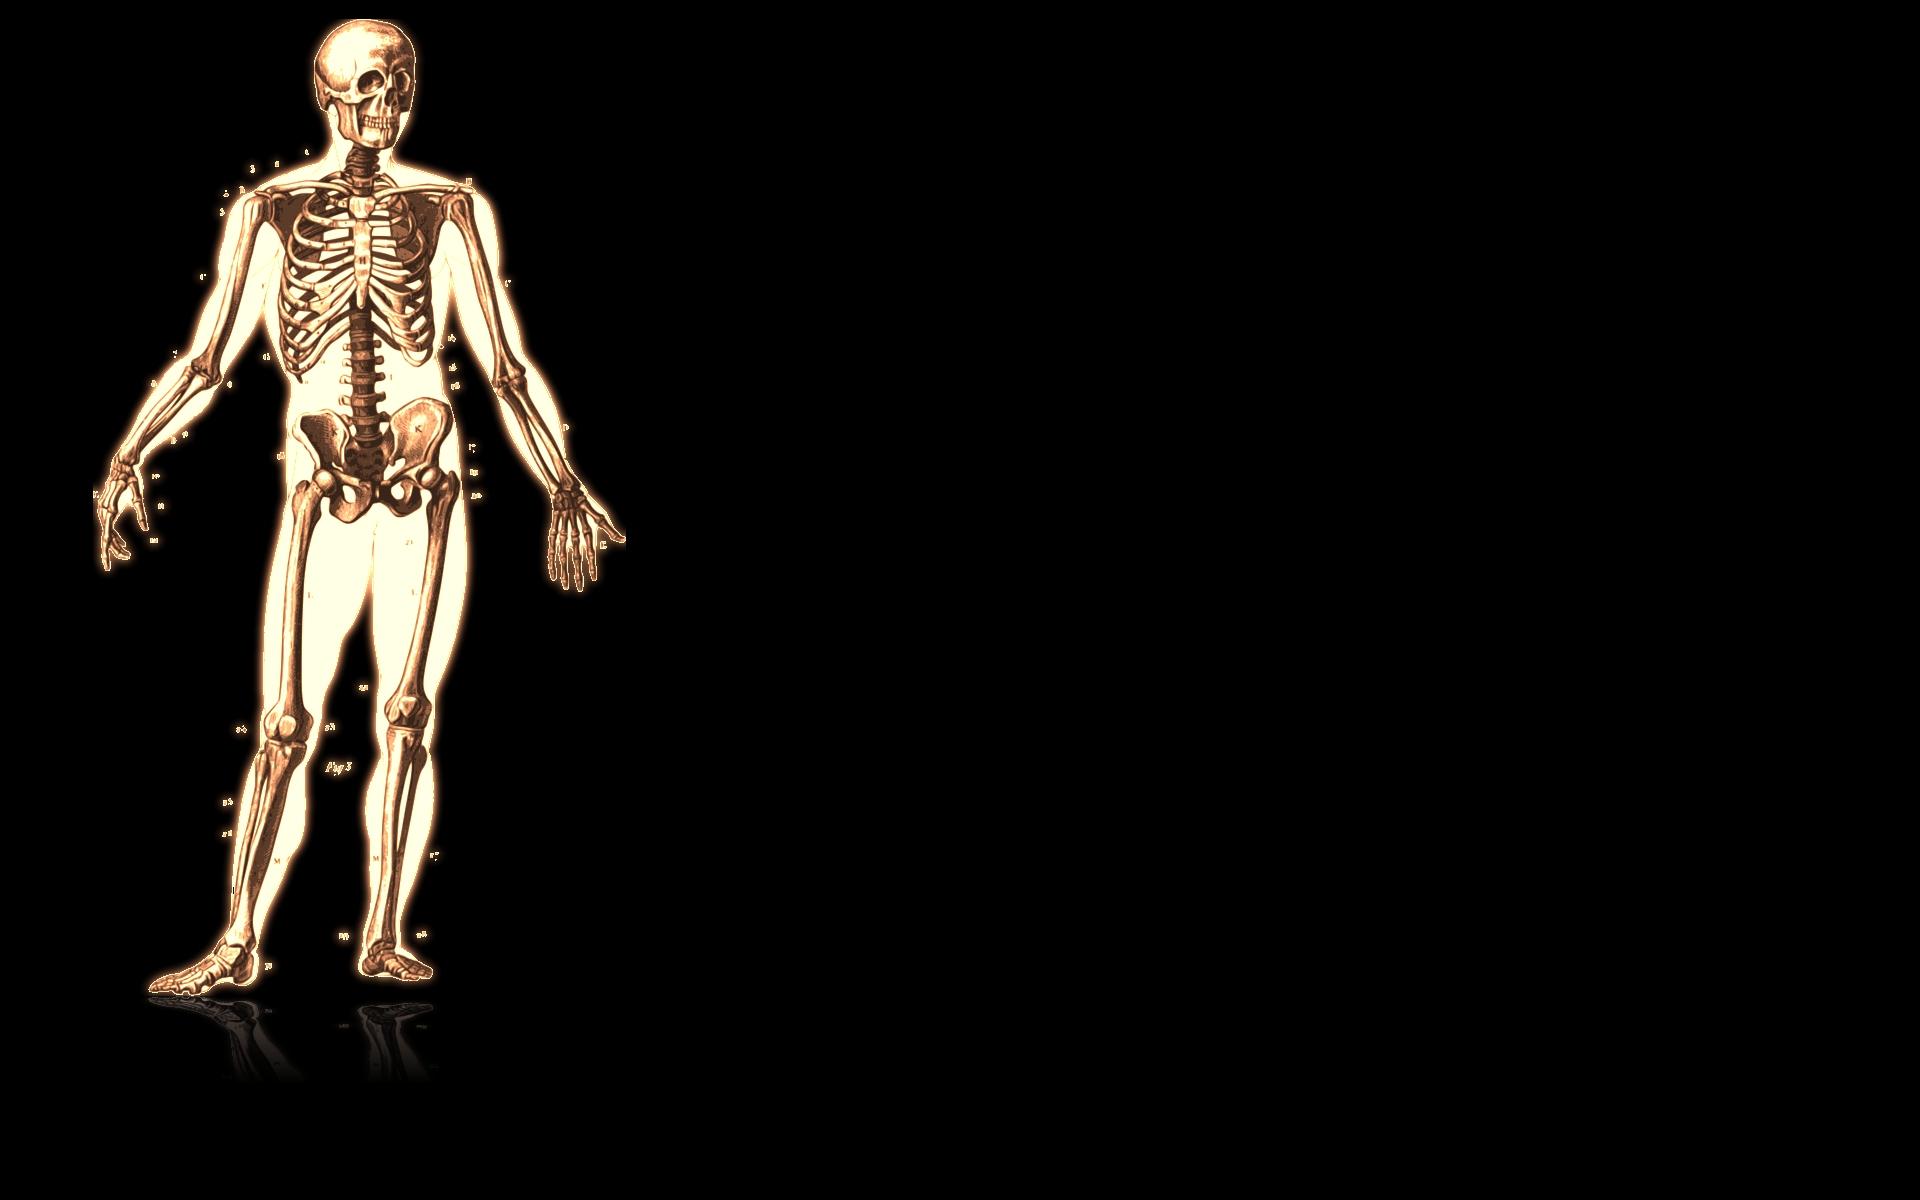 Anatomy HD Wallpaper | Background Image | 1920x1200 | ID ...